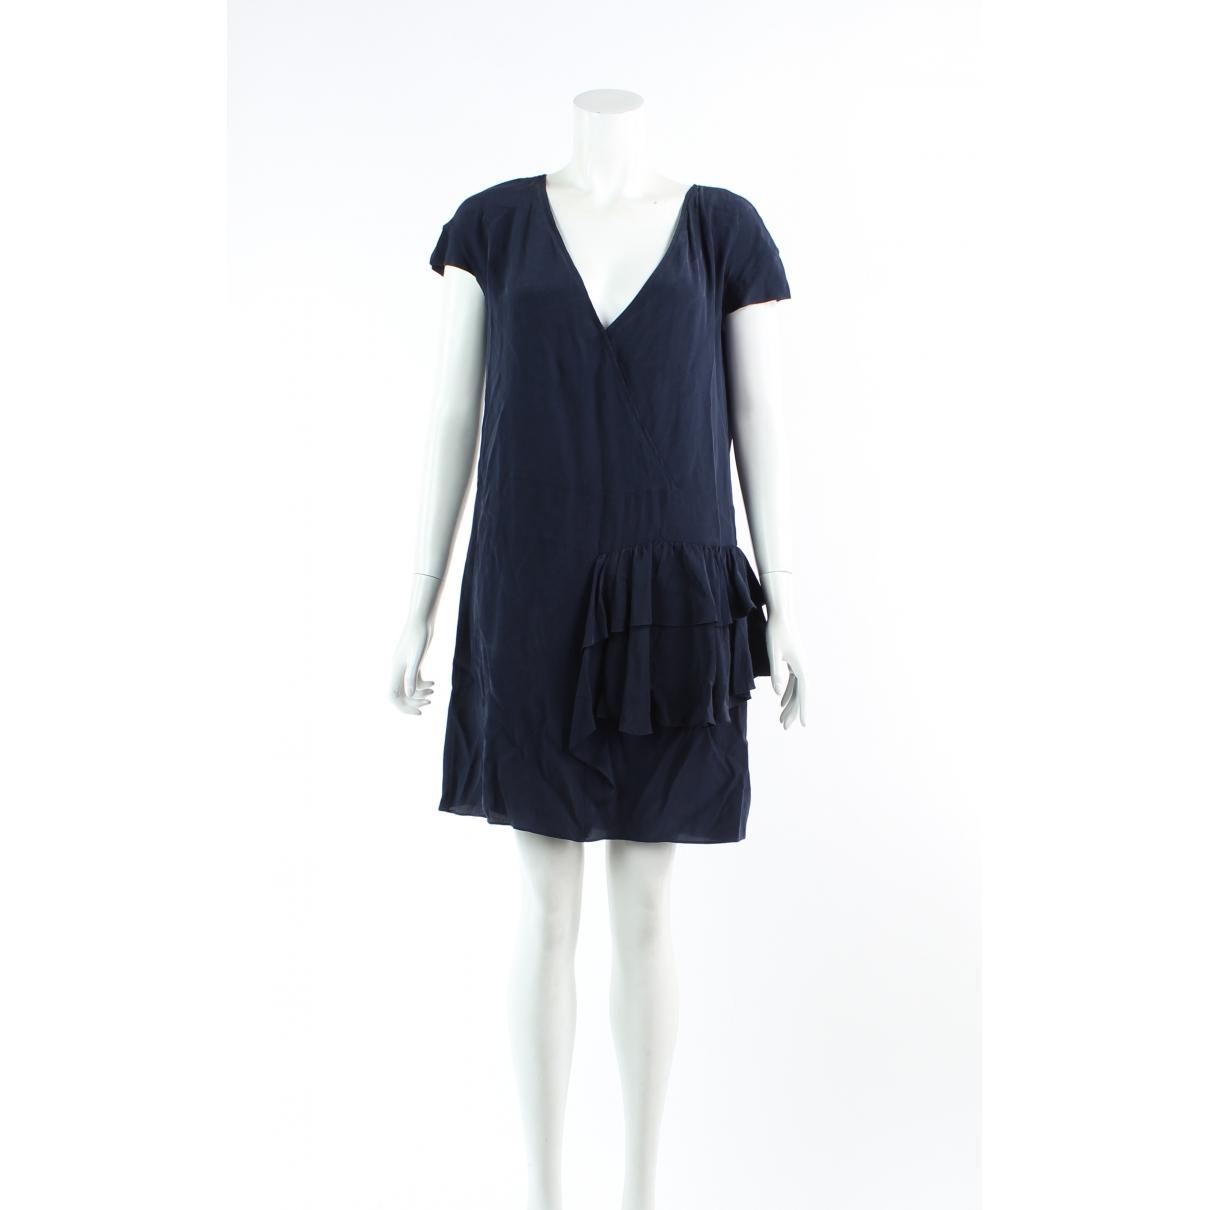 Miu Miu \N Navy Silk dress for Women 42 FR